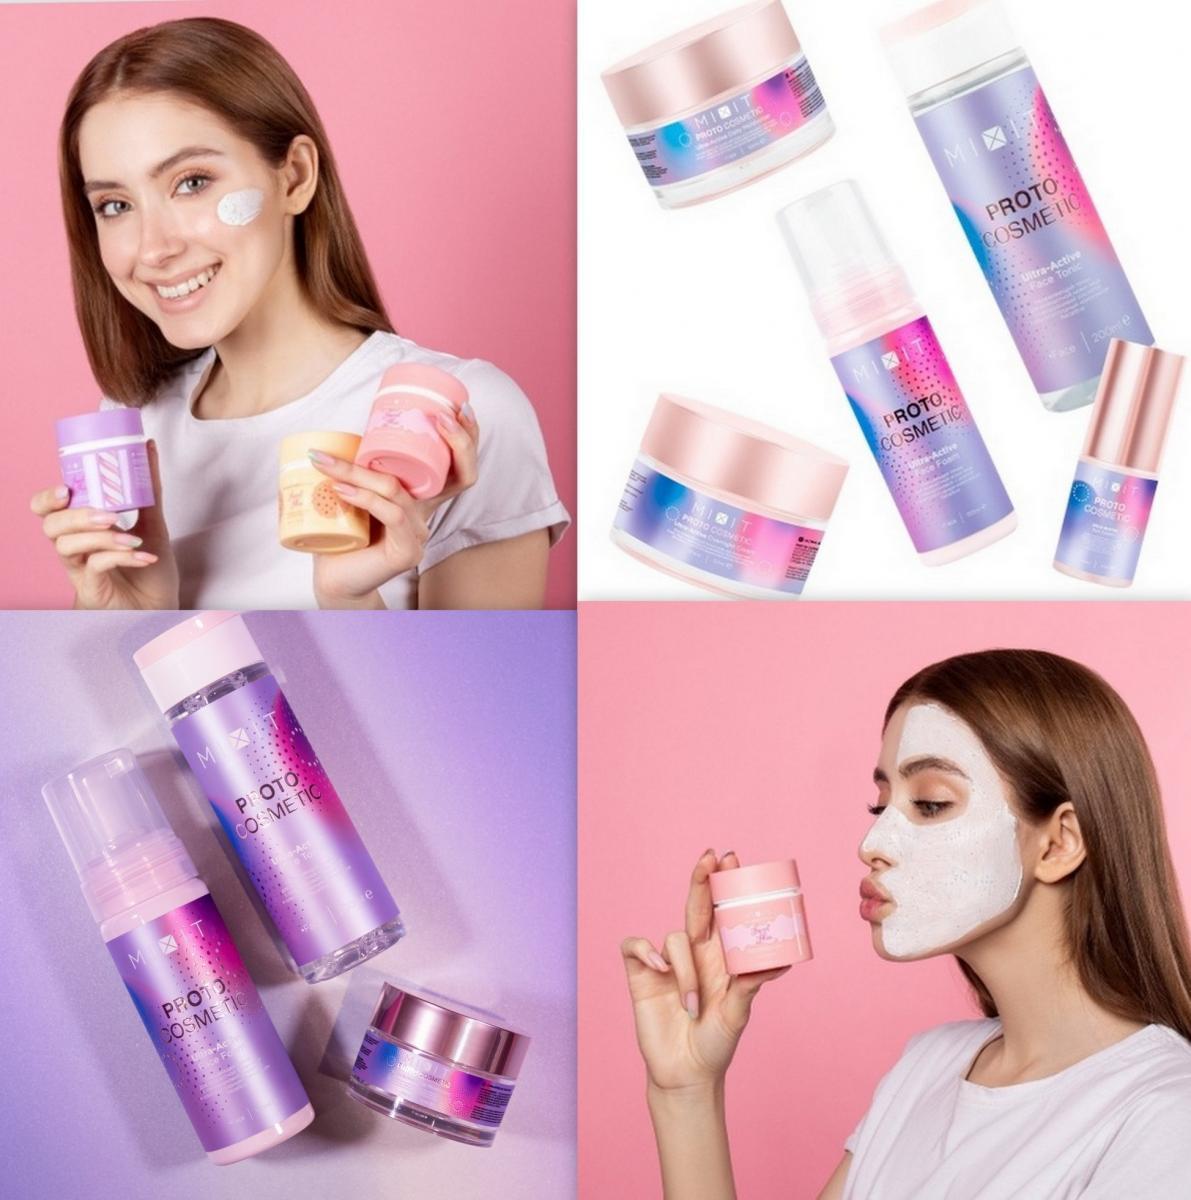 Новинки от MIXIT: инновационная антивозрастная линейка с пептидами и серия масок Sweet Skin